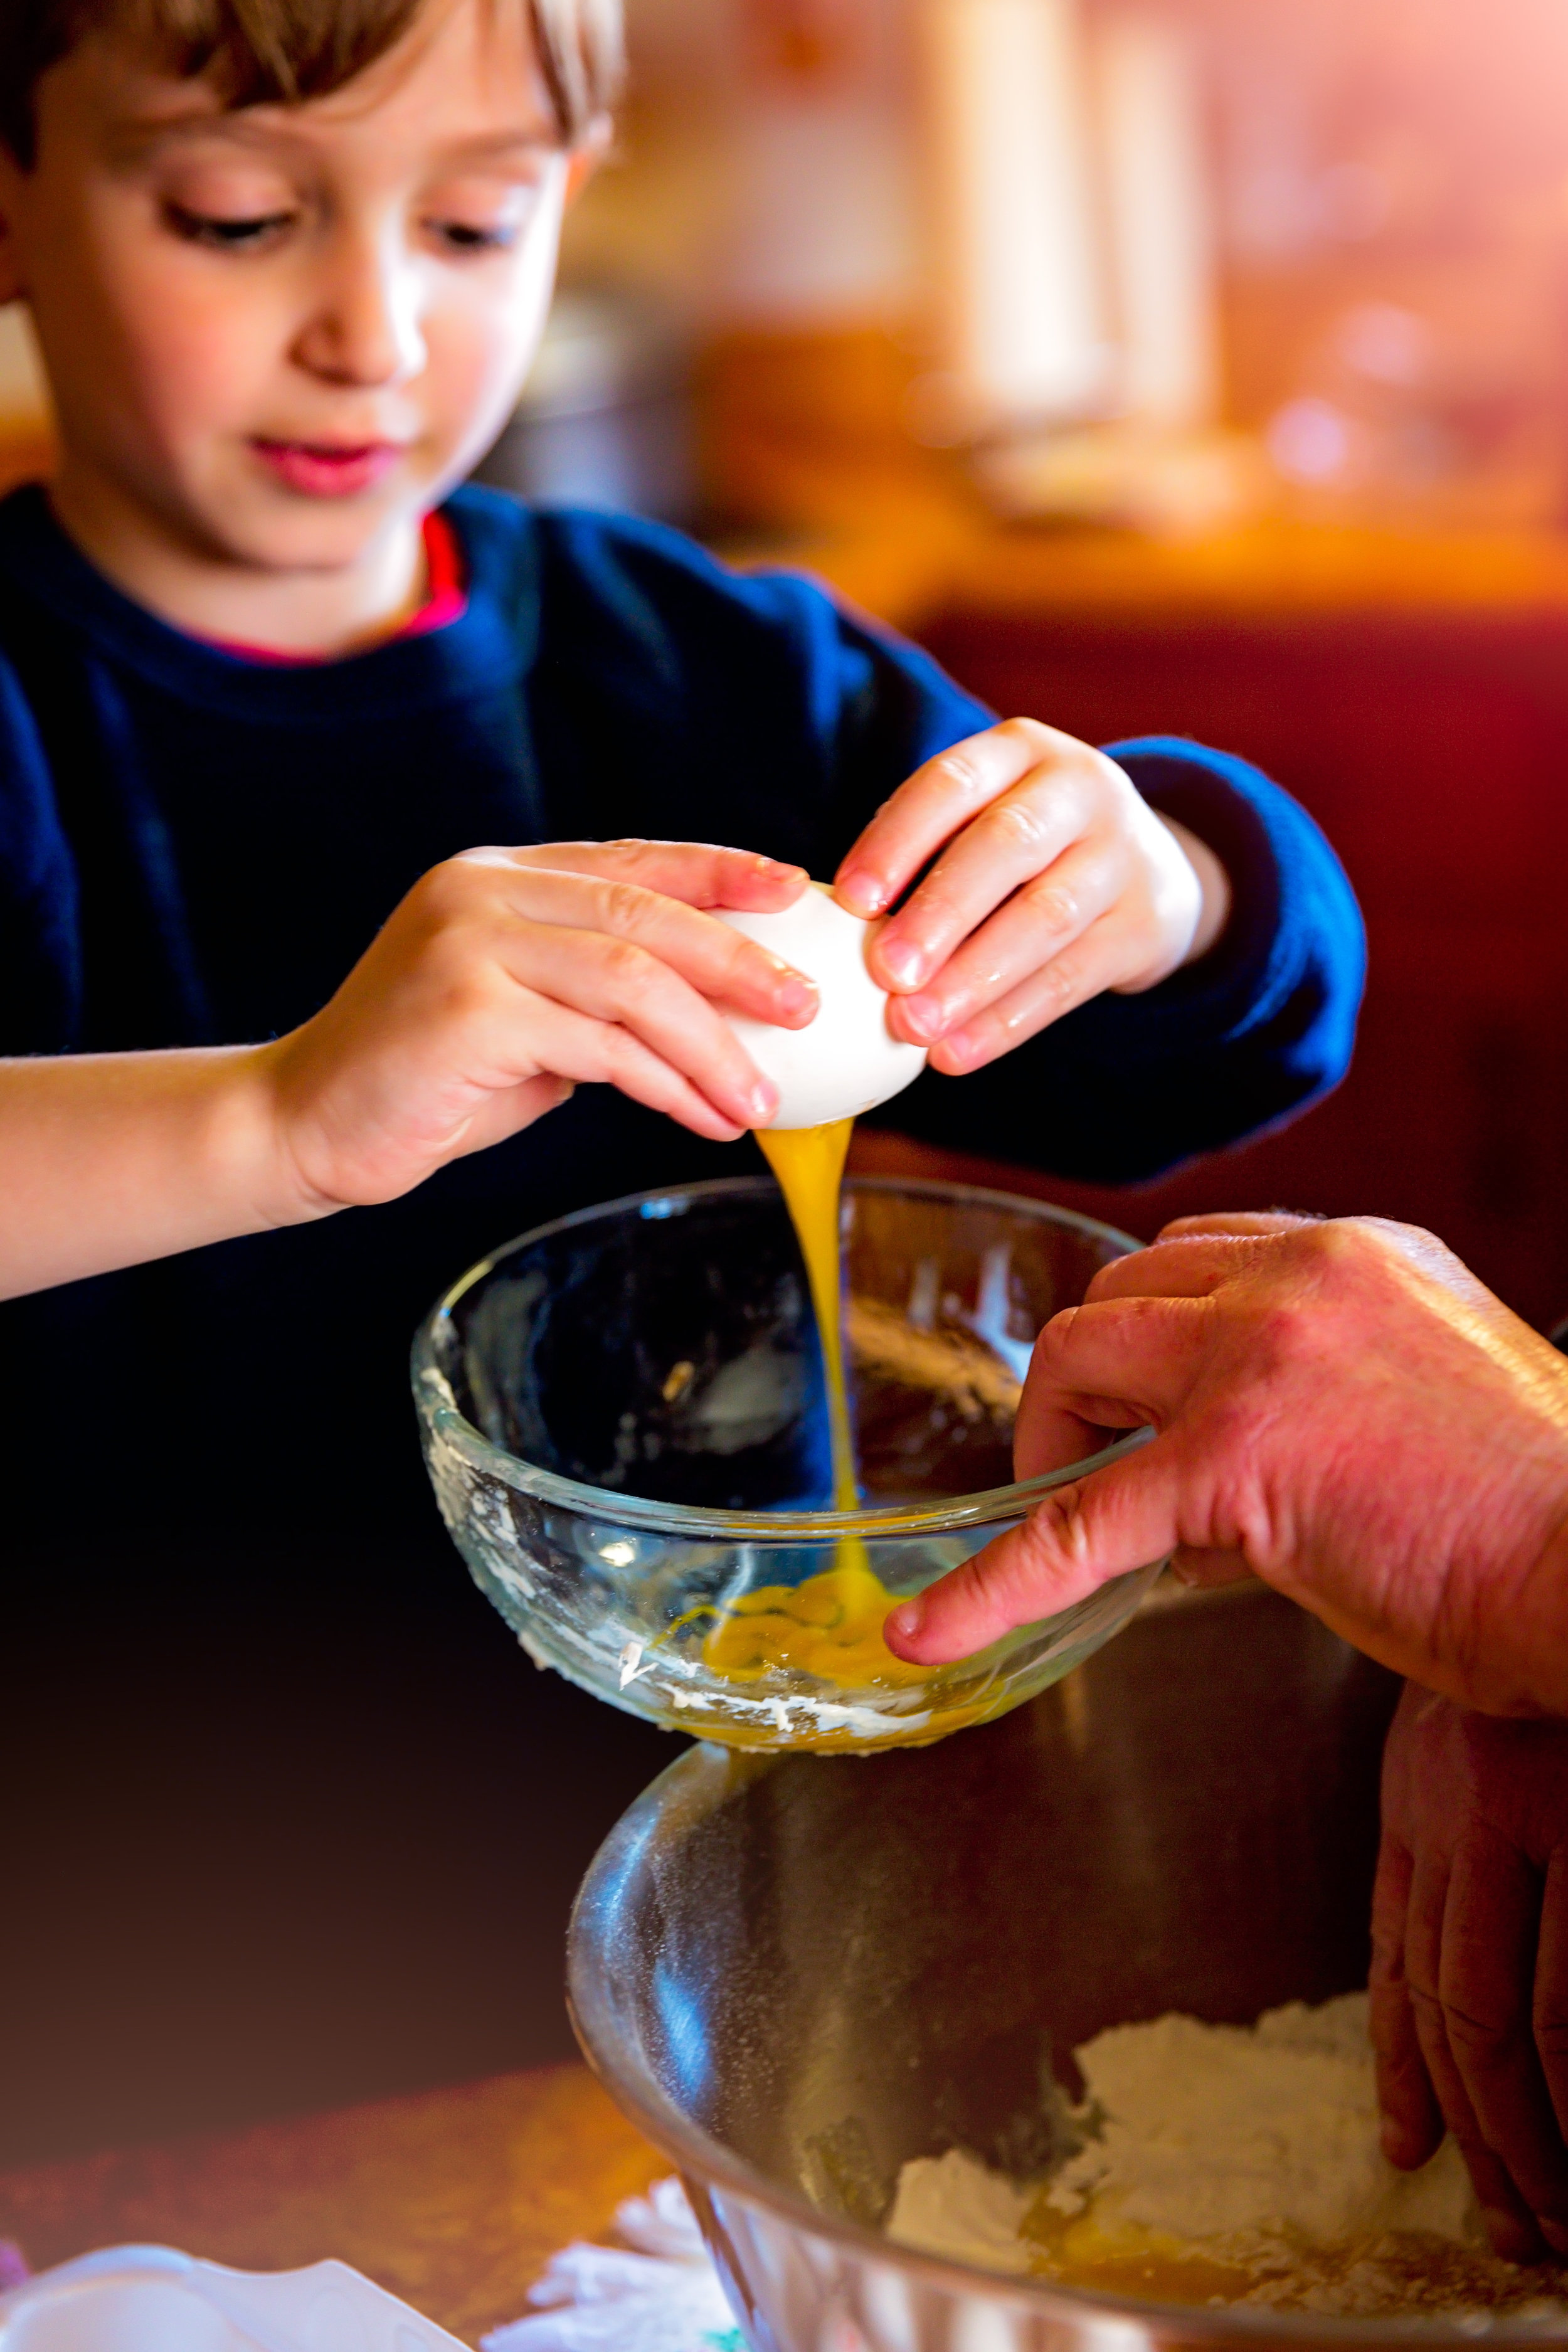 Canva - Baking, Children, Cooking, Education, Grandparents.jpg